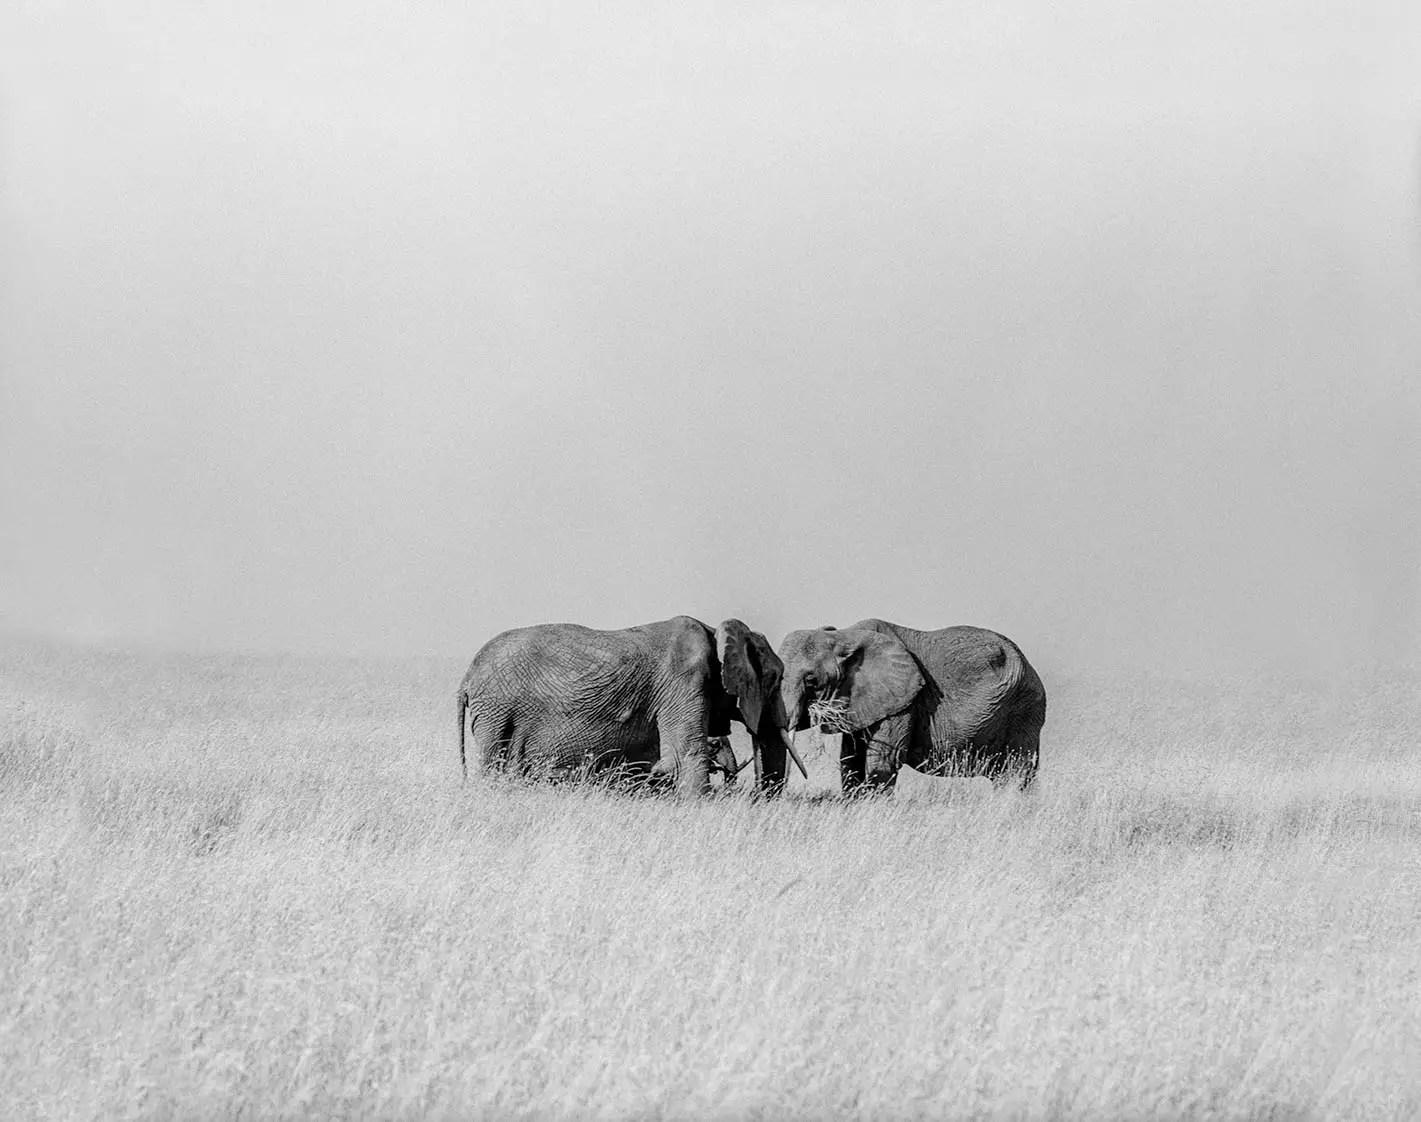 Elephant Rendezvous, Serengeti, Tanzania - ILFORD HP5 HP5 in Pyro PMK. Pentax 67II 135mm